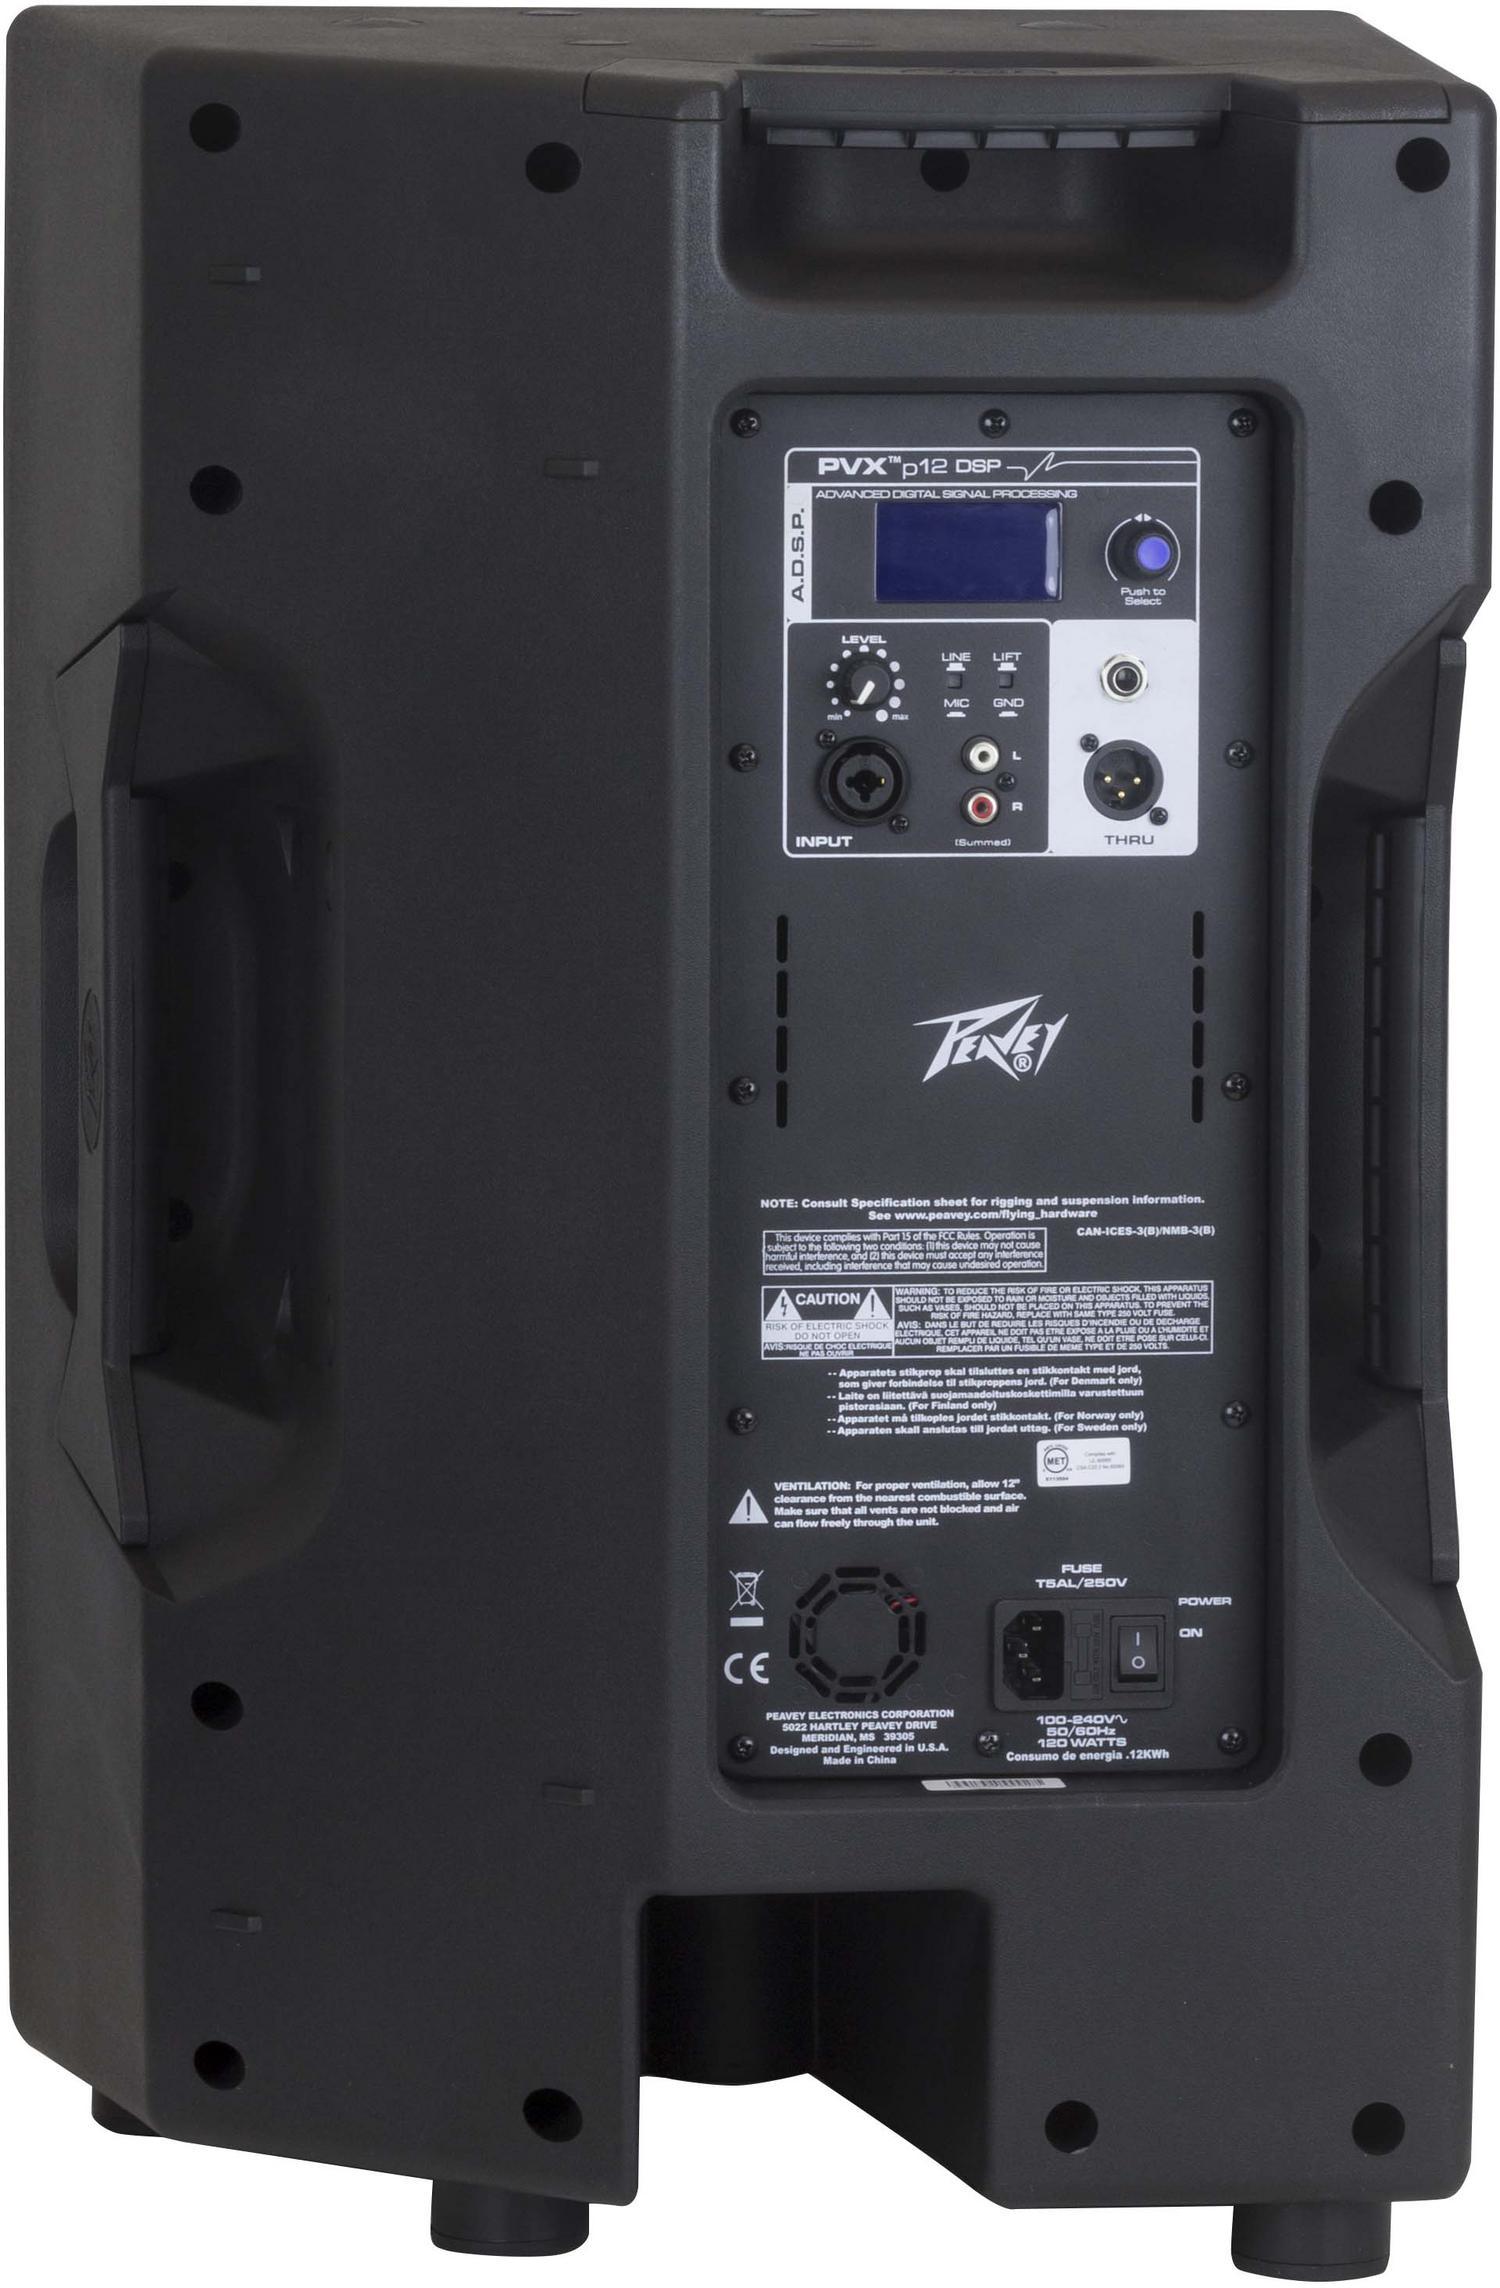 Peavey PVXp 12 Active Enclosure Speaker back panel view